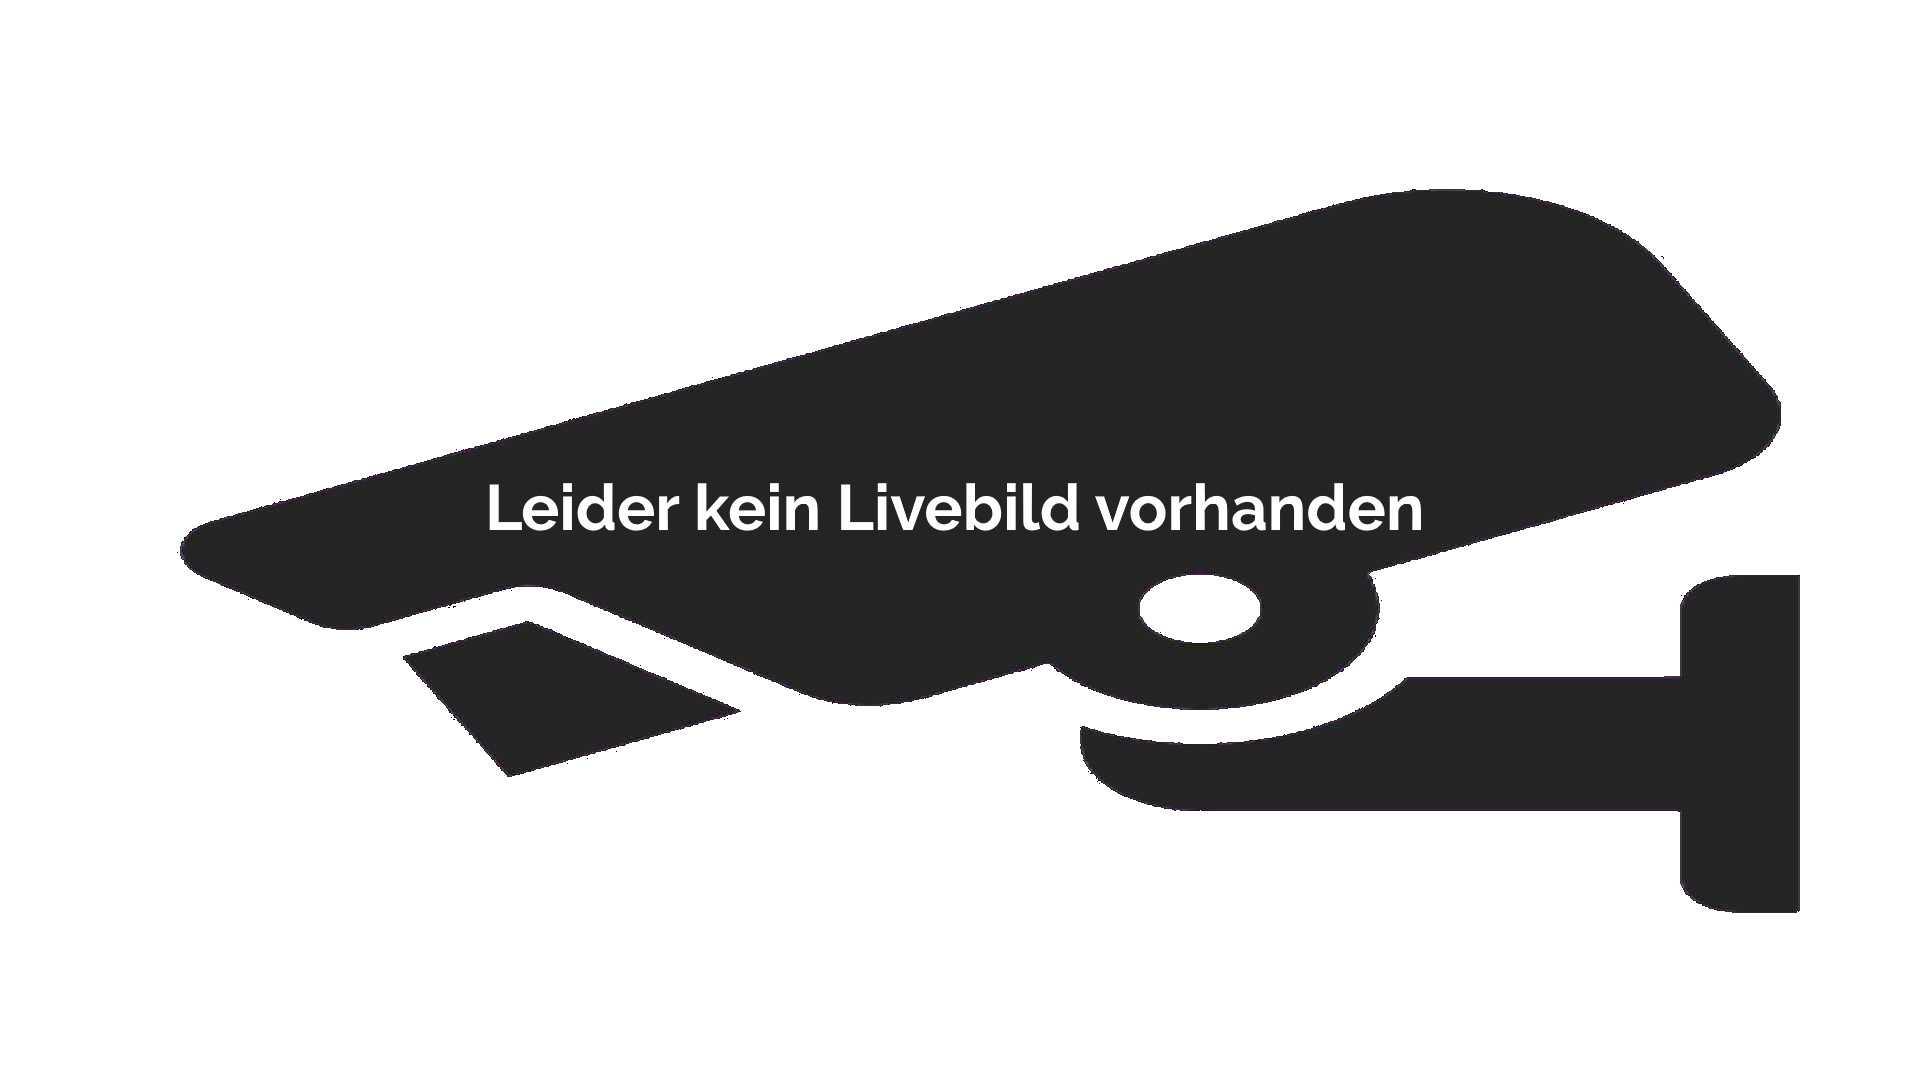 https://meteo-oberwallis.ch/imgtr.php?b=http://meteo-oberwallis.ch/webcam/brig/schlossgarten.php&t=5a106186b7b8a